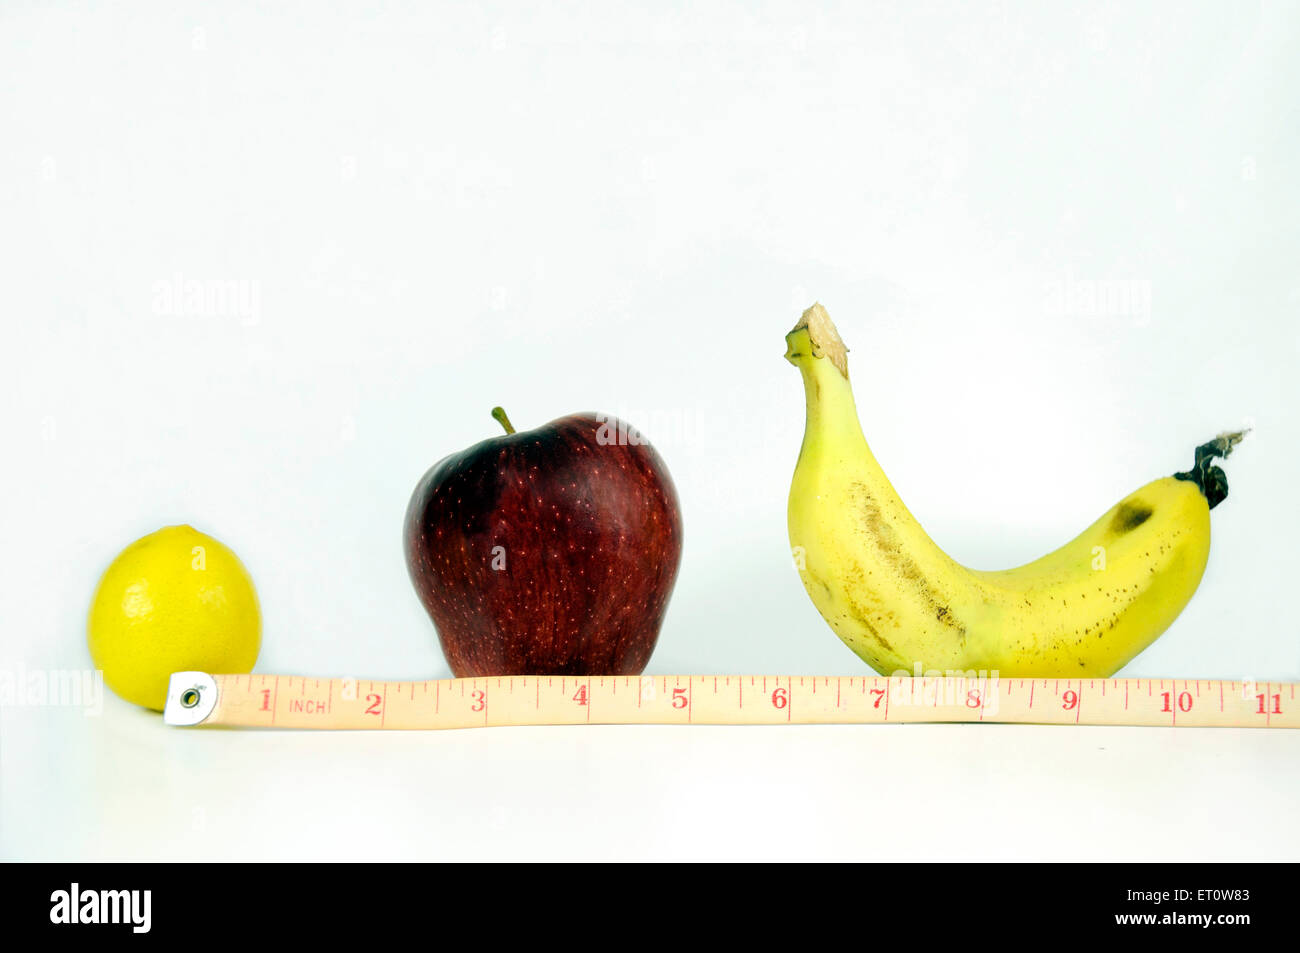 Measuring tape showing inches lemon apple banana on white background India Asia - Stock Image